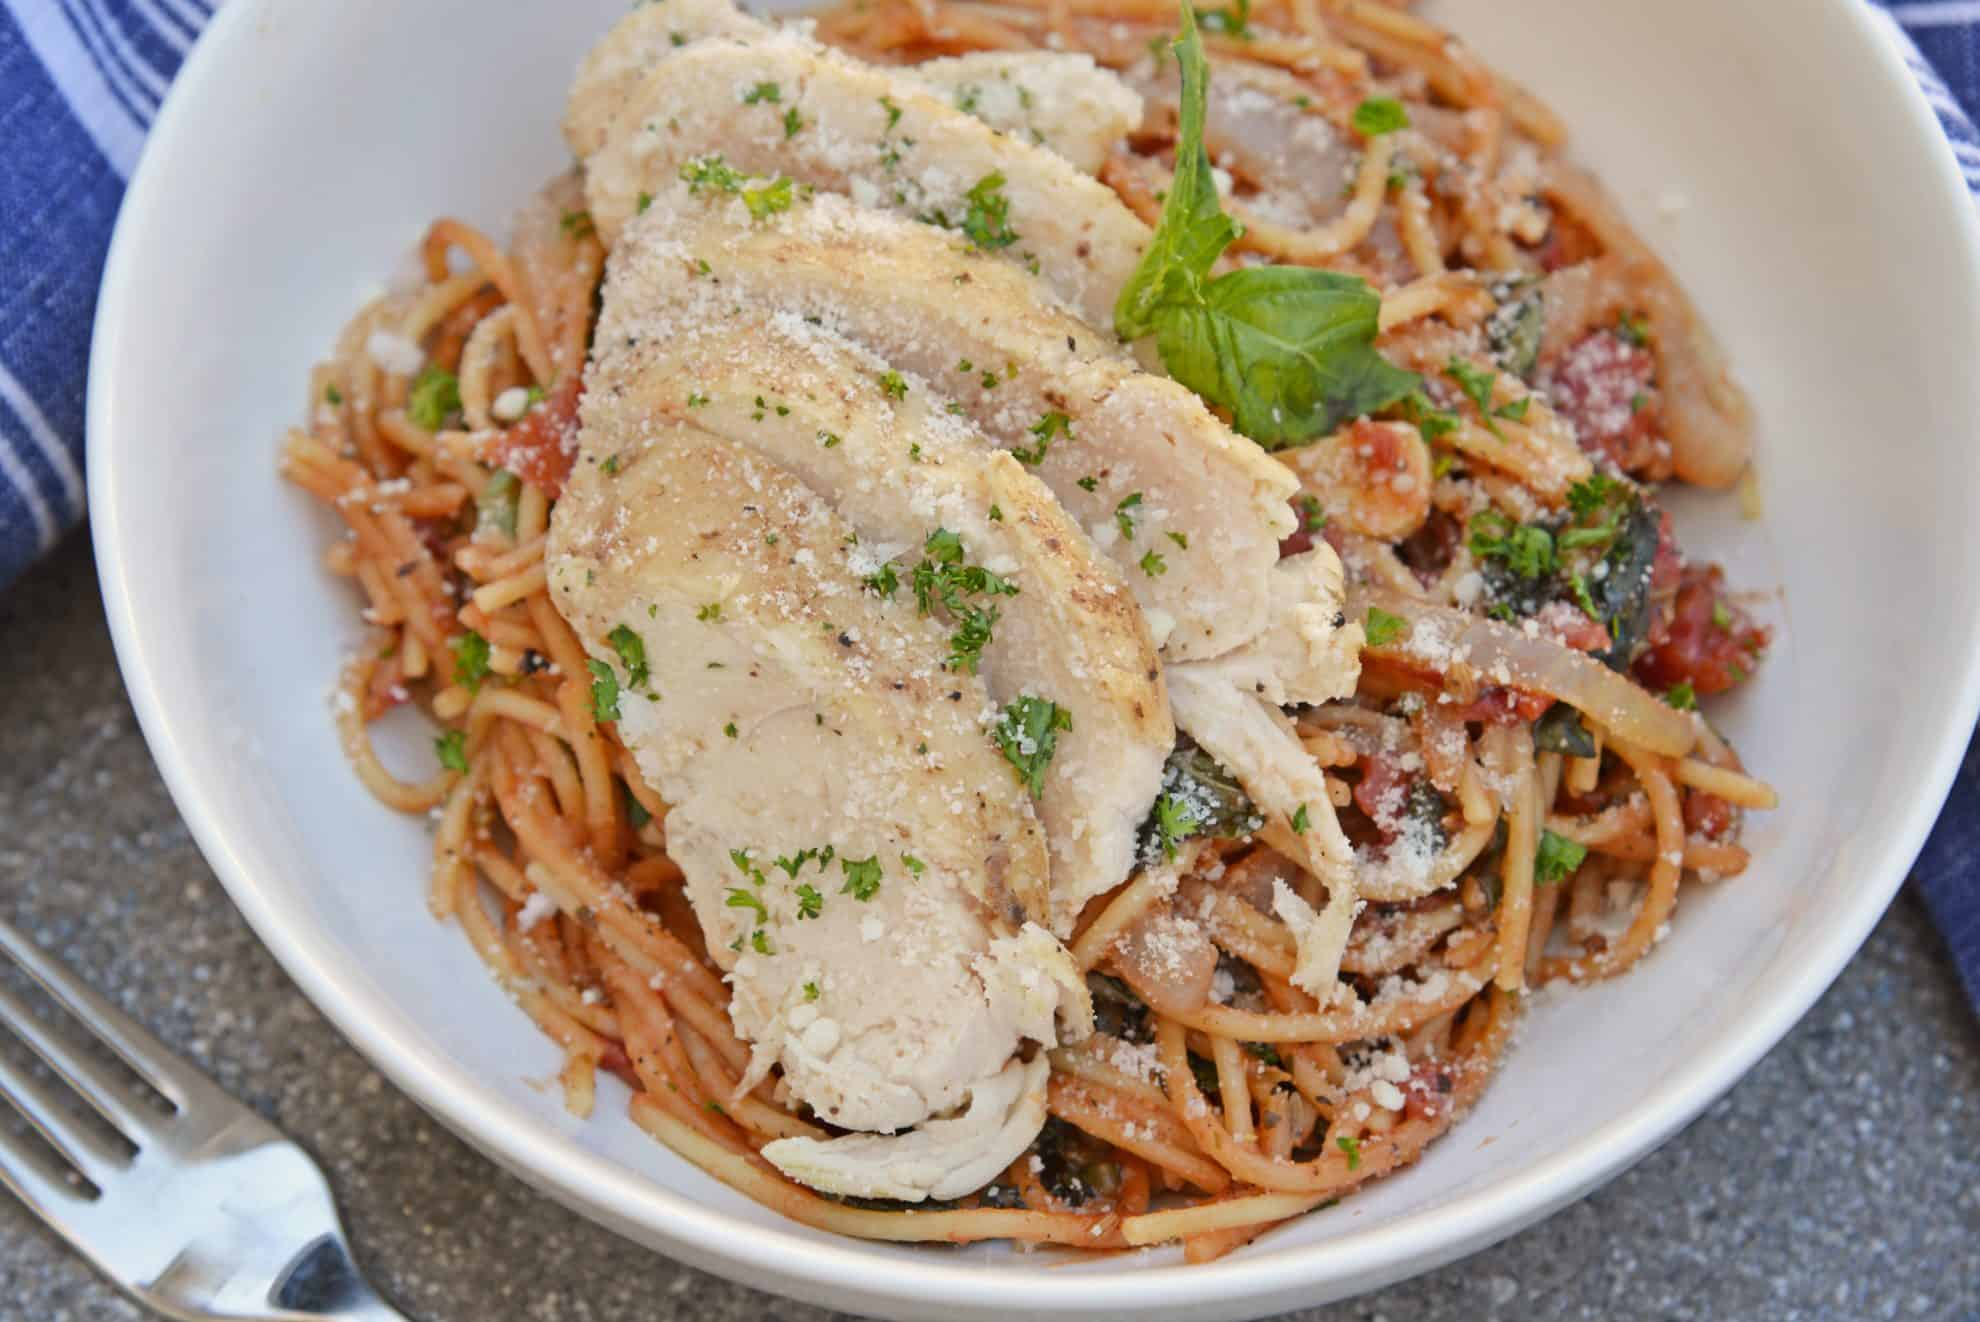 Tomato Basil Chicken Pasta in a white bowl